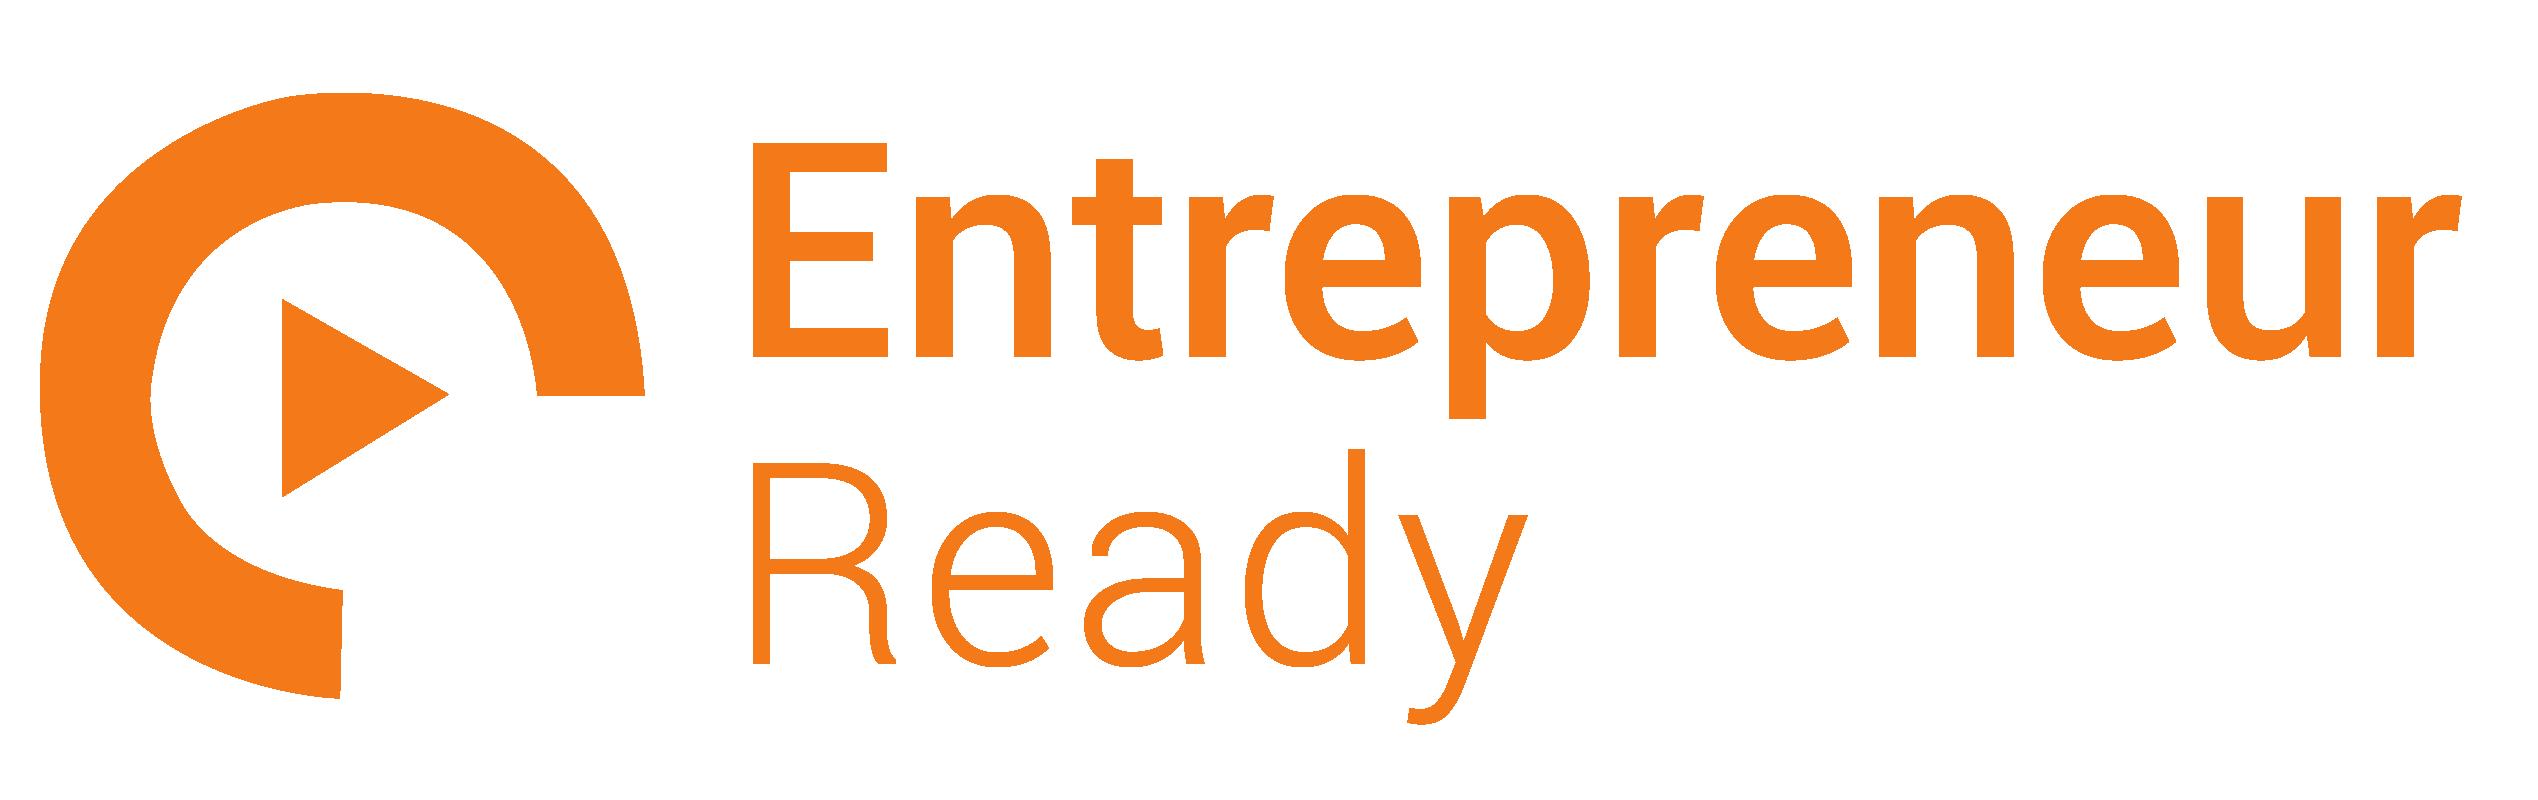 Online Idea Accelerator - Entrepreneur Ready